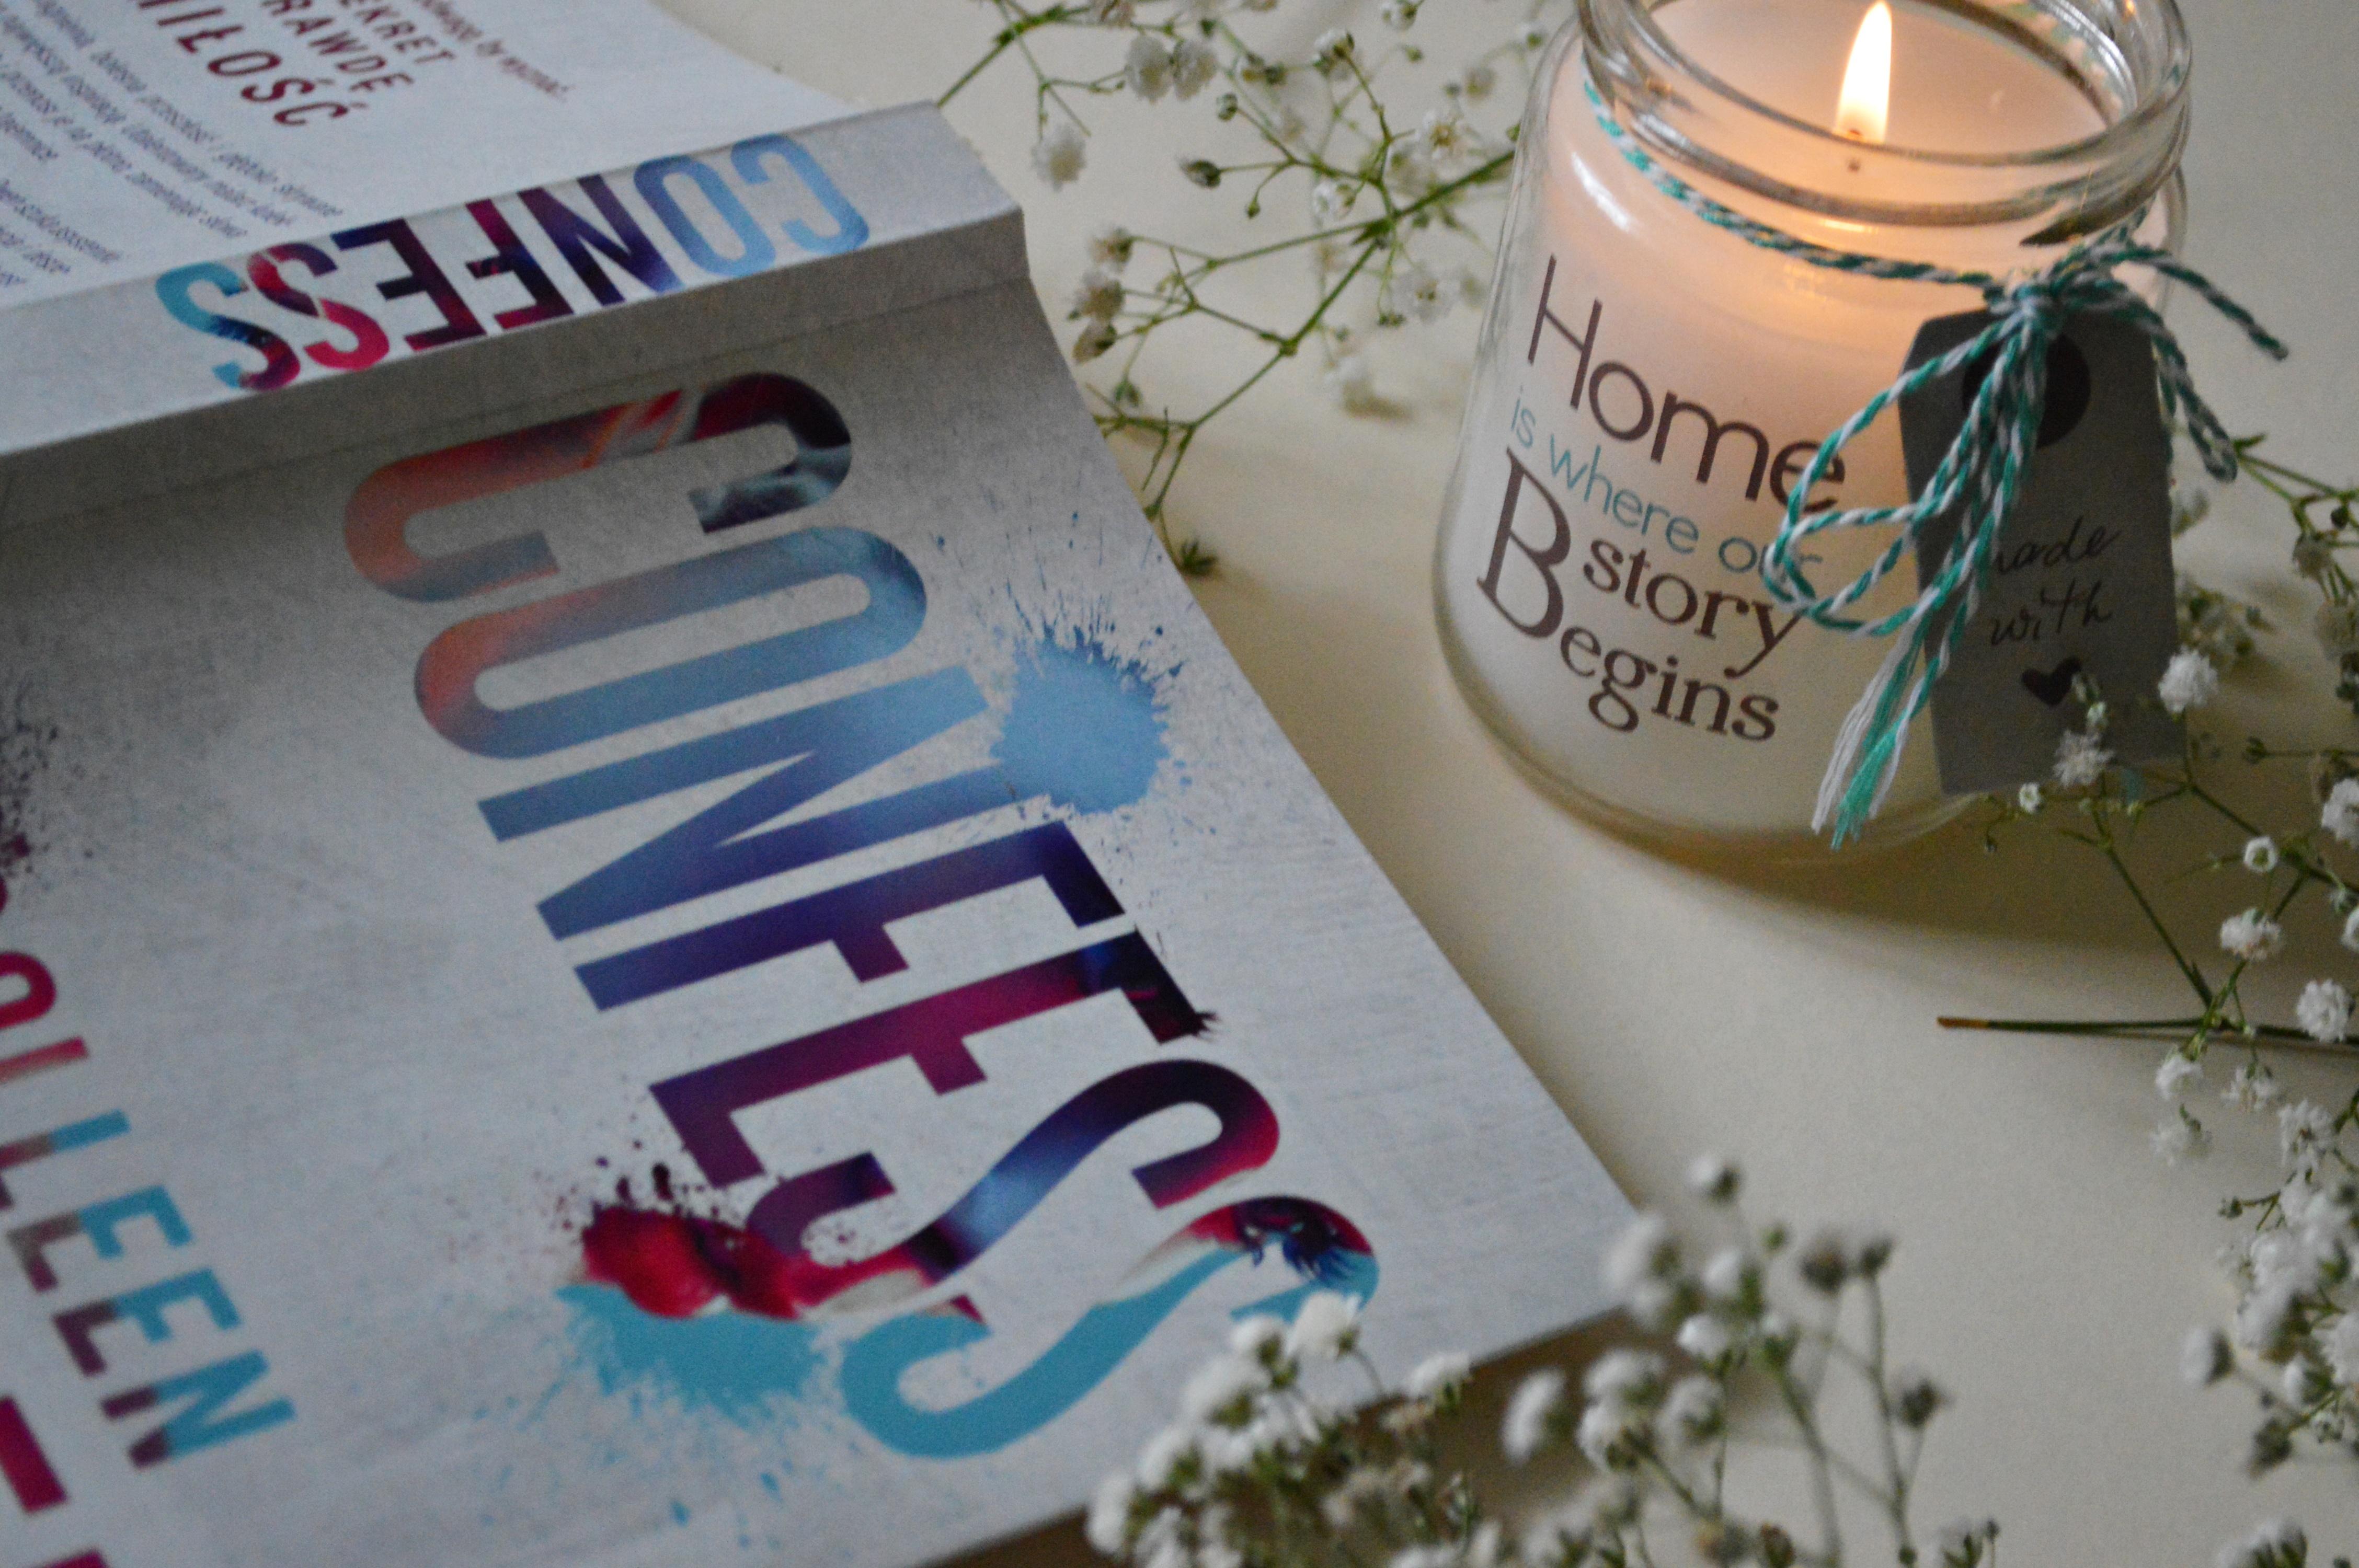 Confess Colleen Hoover Recenzja Ksiazki Zazyjkultury Pl